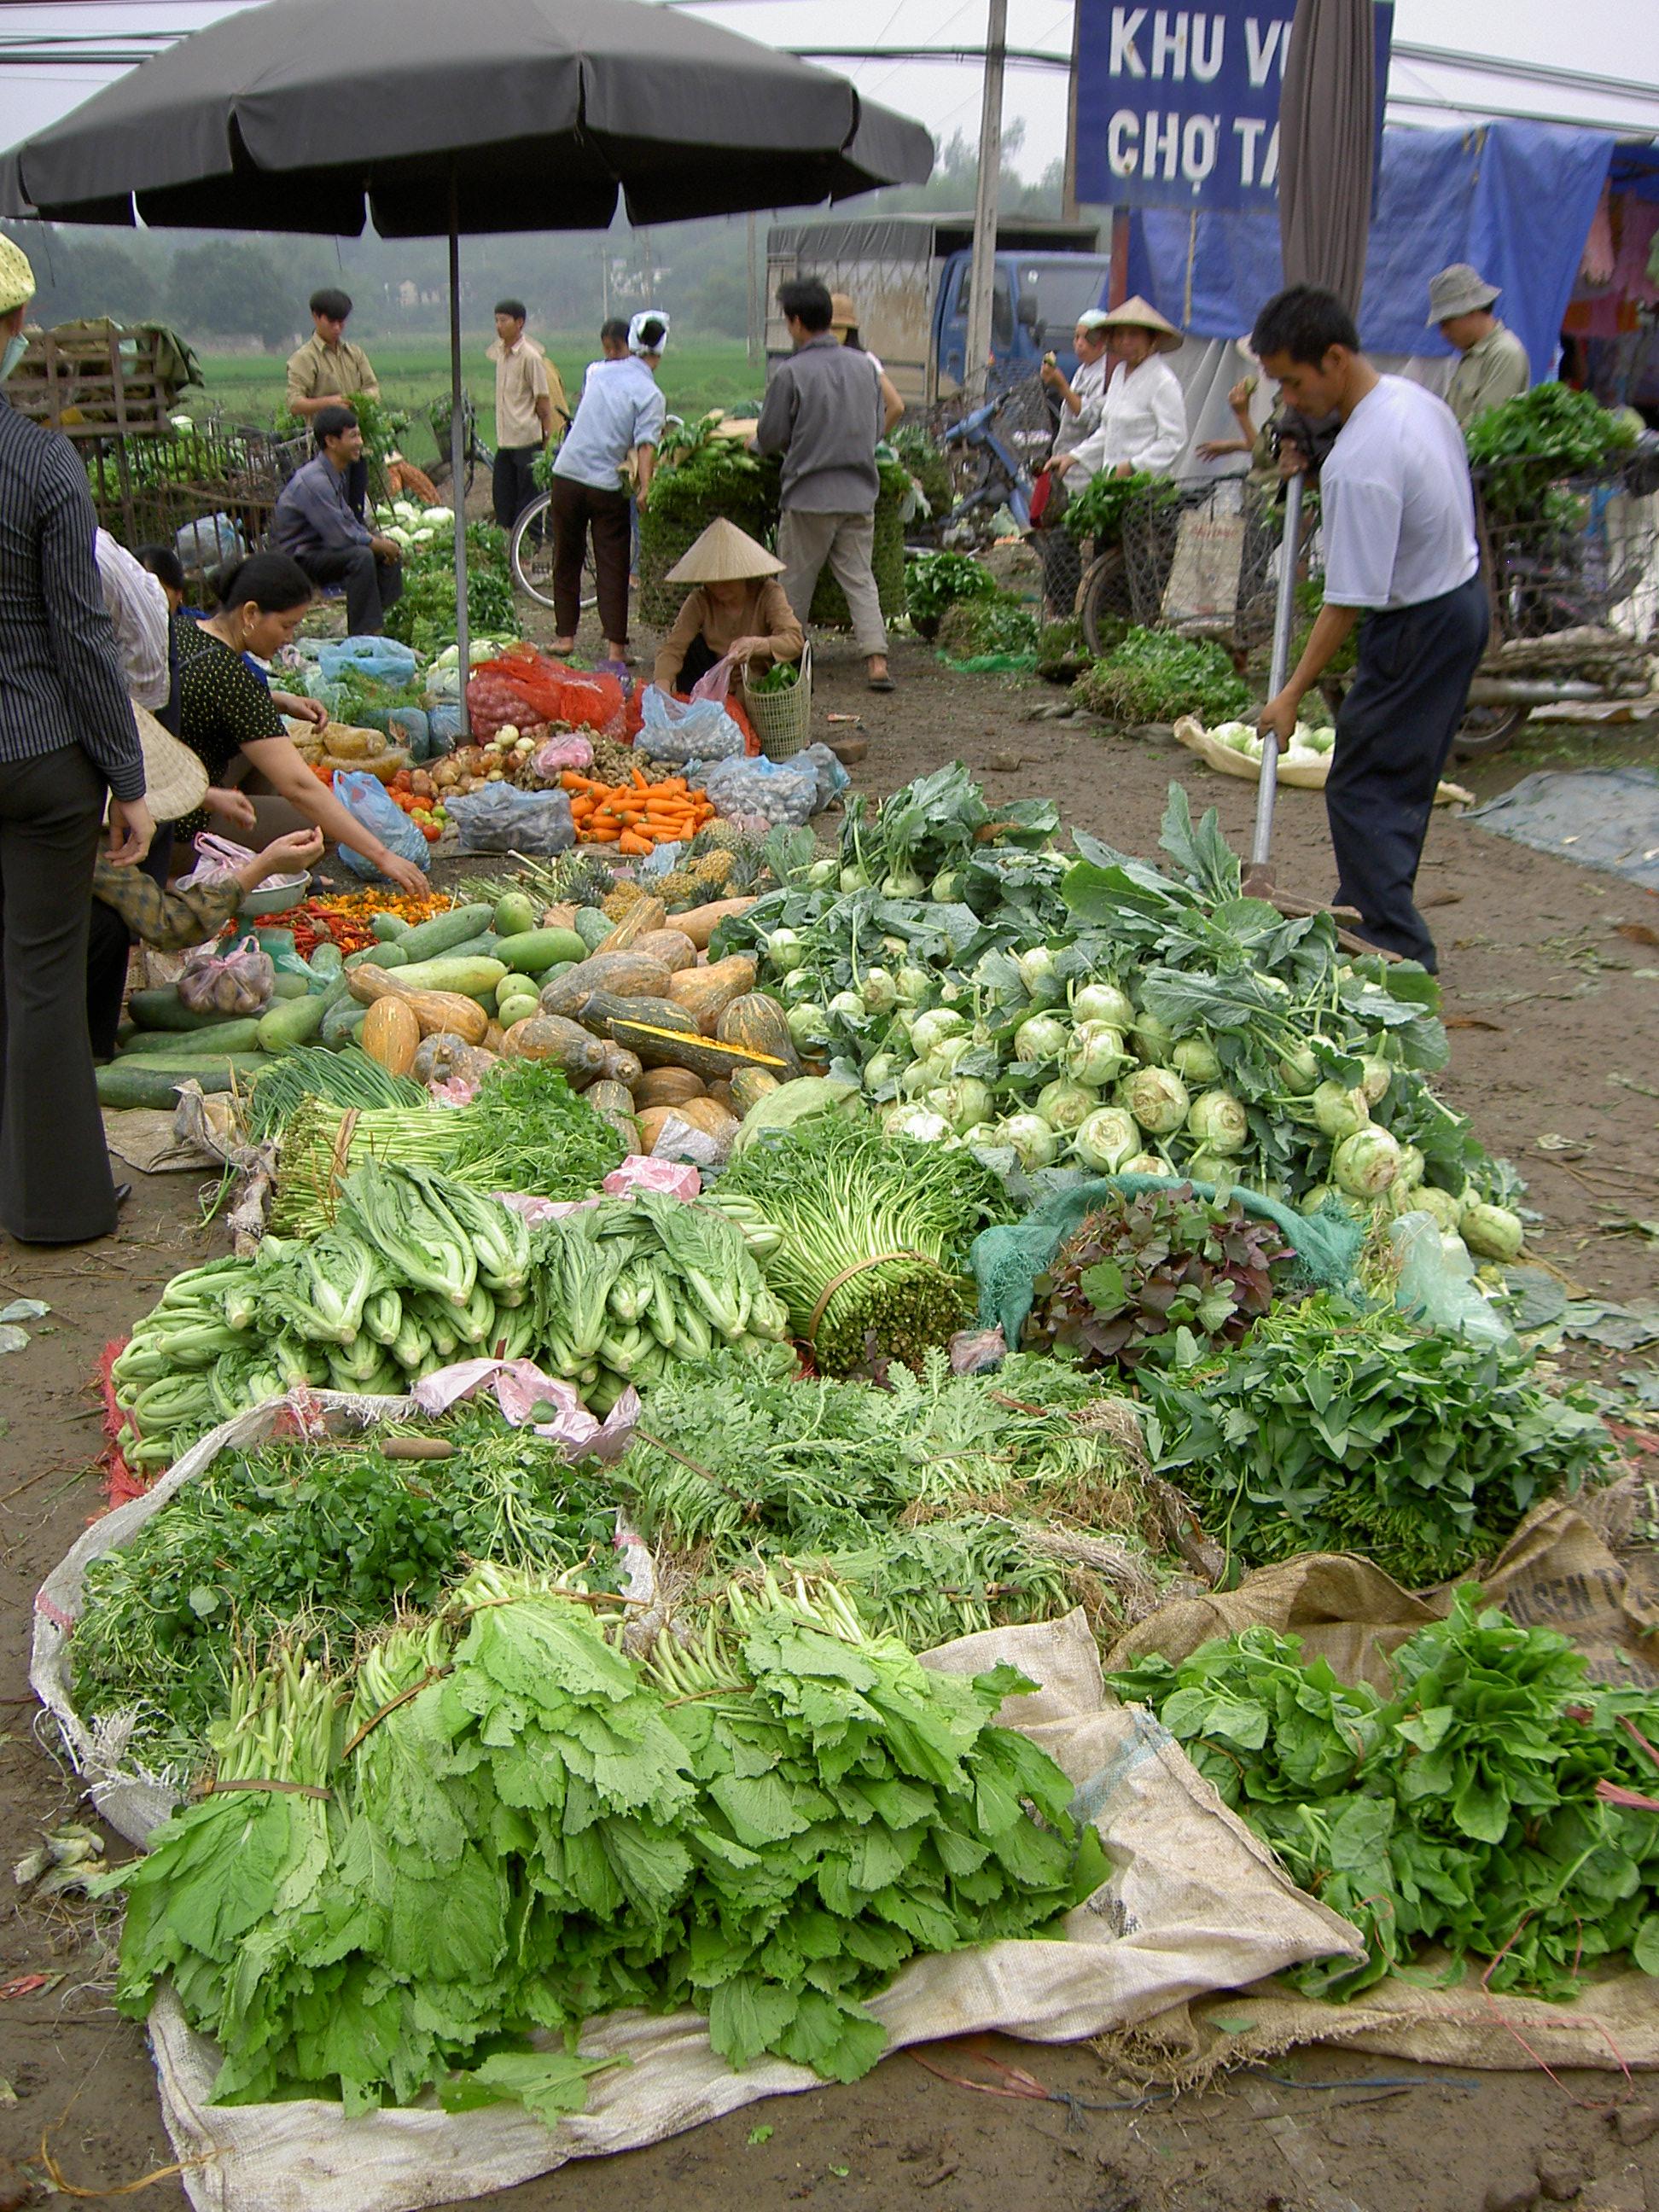 Groenteverkoop In Vietnam Vegetables